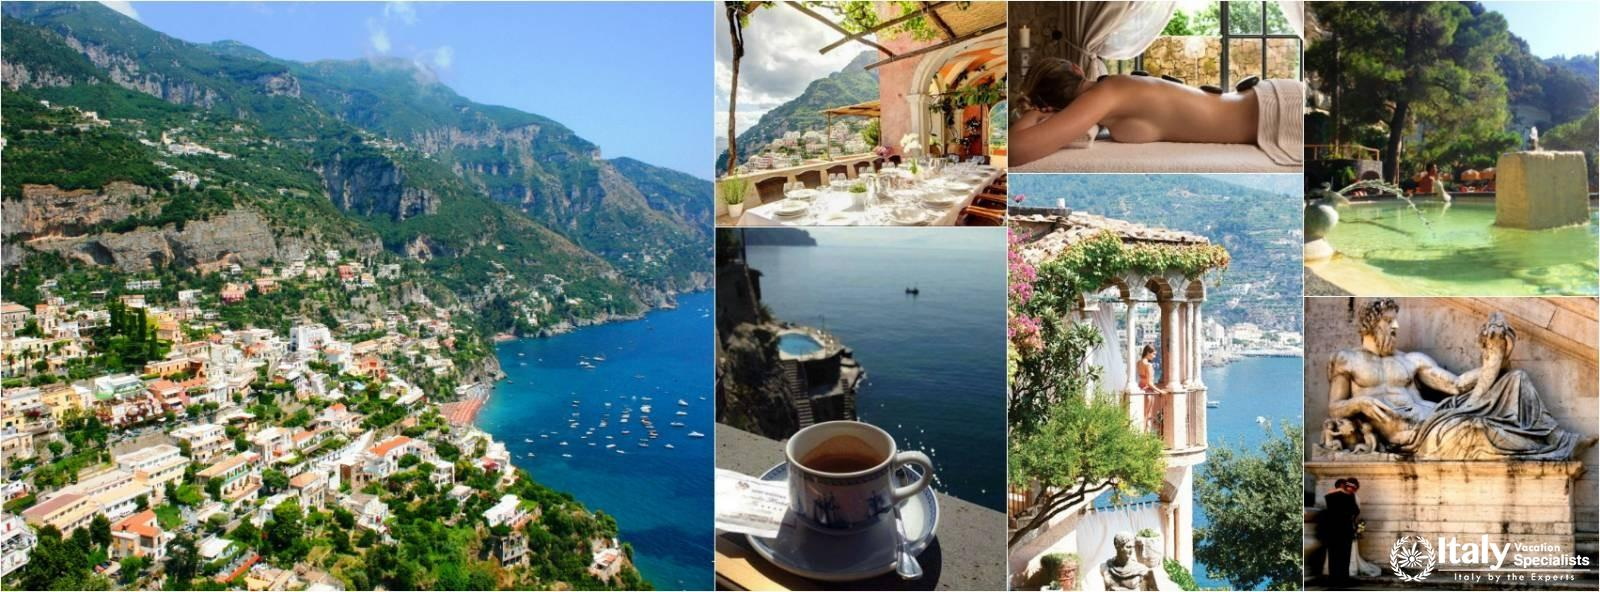 Best Life Ever Tours & Retreats Amalfi Coast